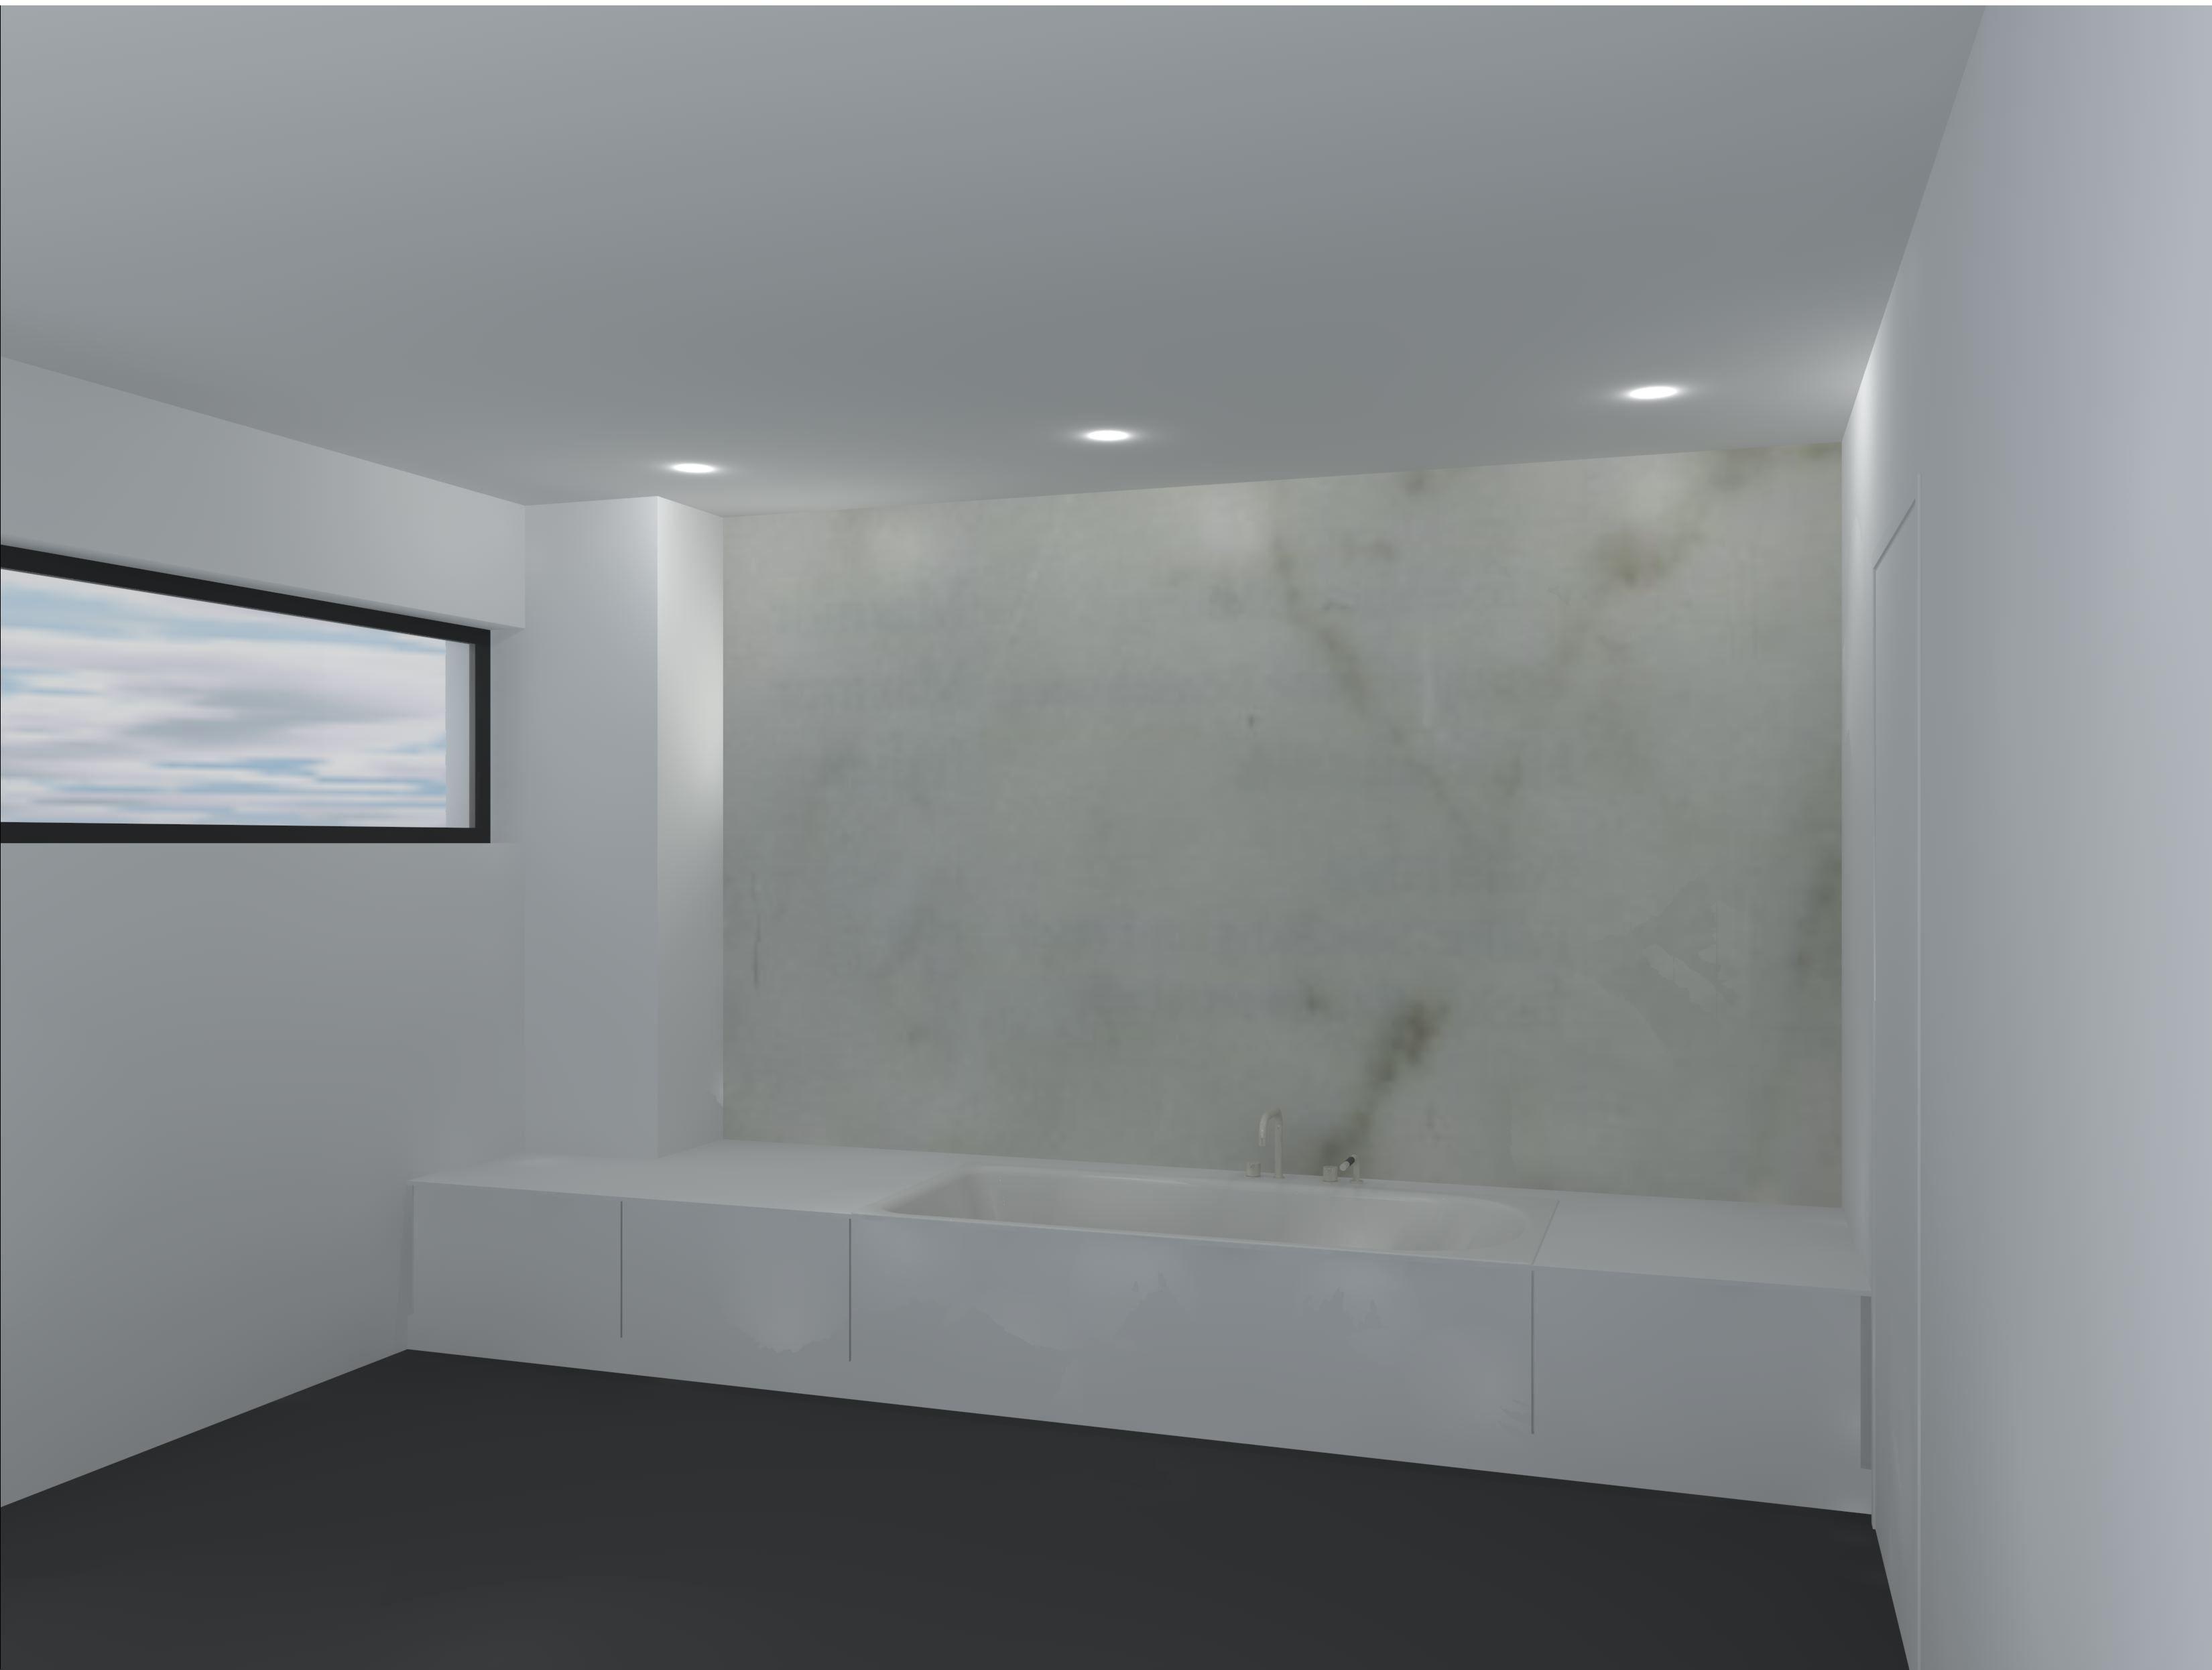 Badkamer Spotjes : Verlichting via spotjes in plafond Bathroom ...